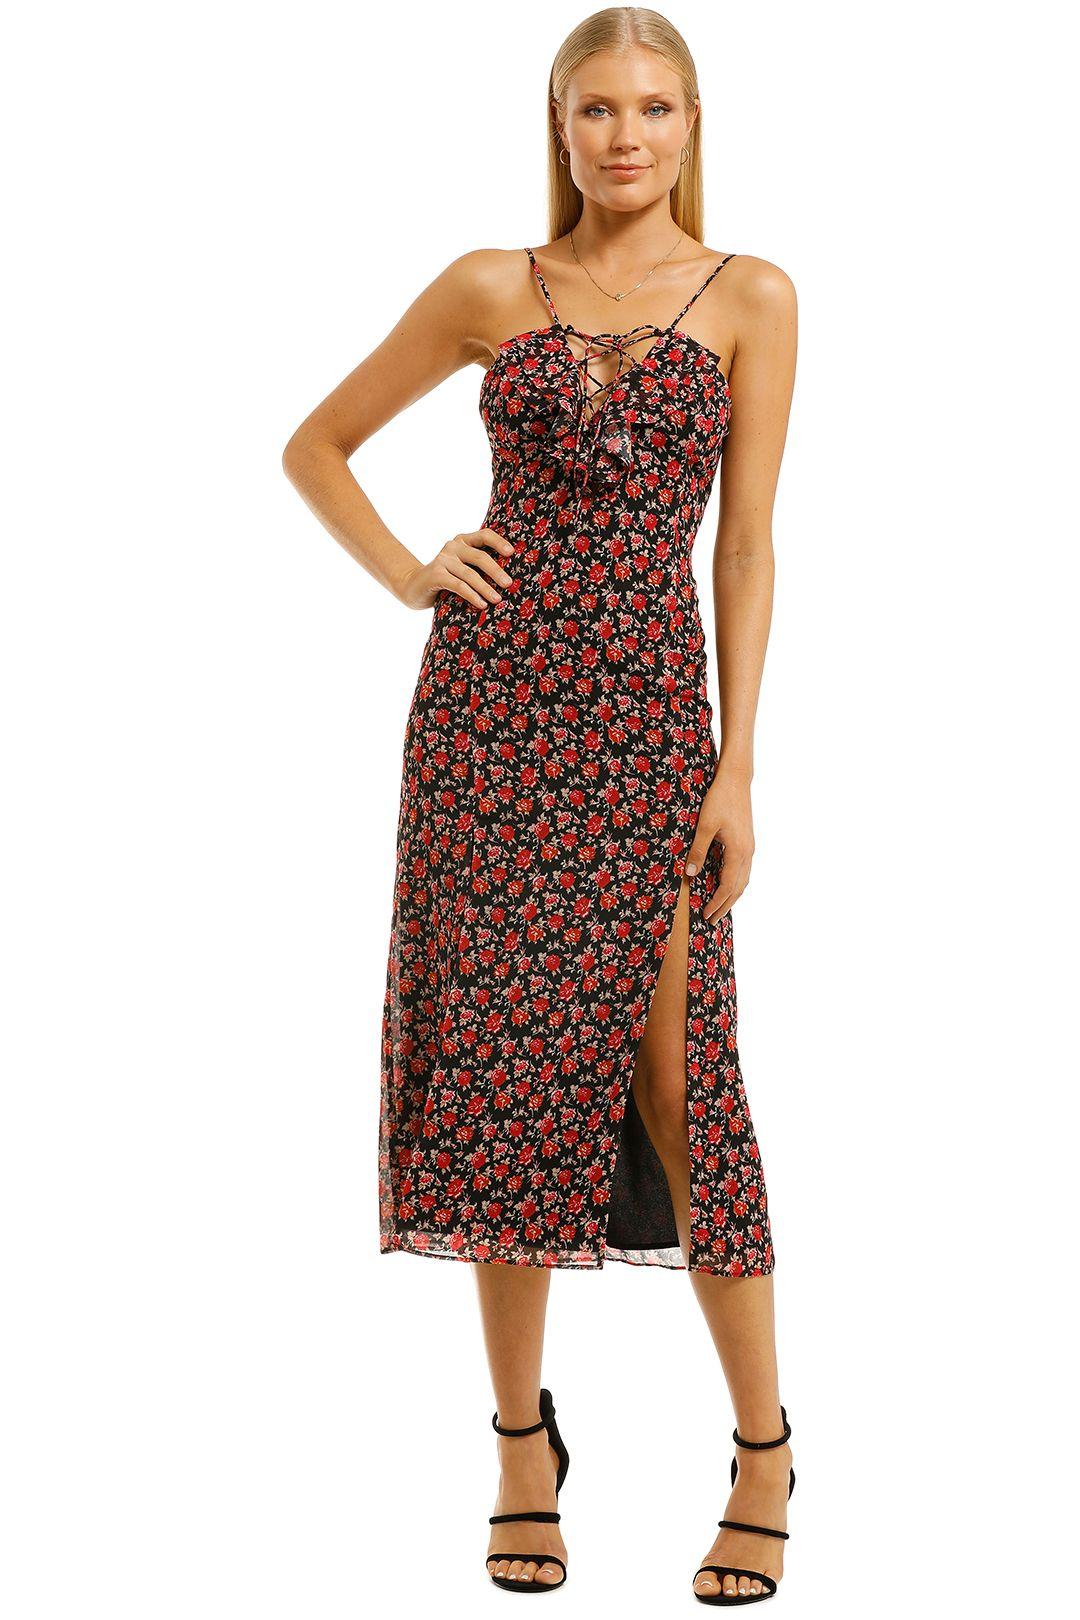 The-East-Order-Nicola-Midi-Dress-Senorita-Fleur-Front